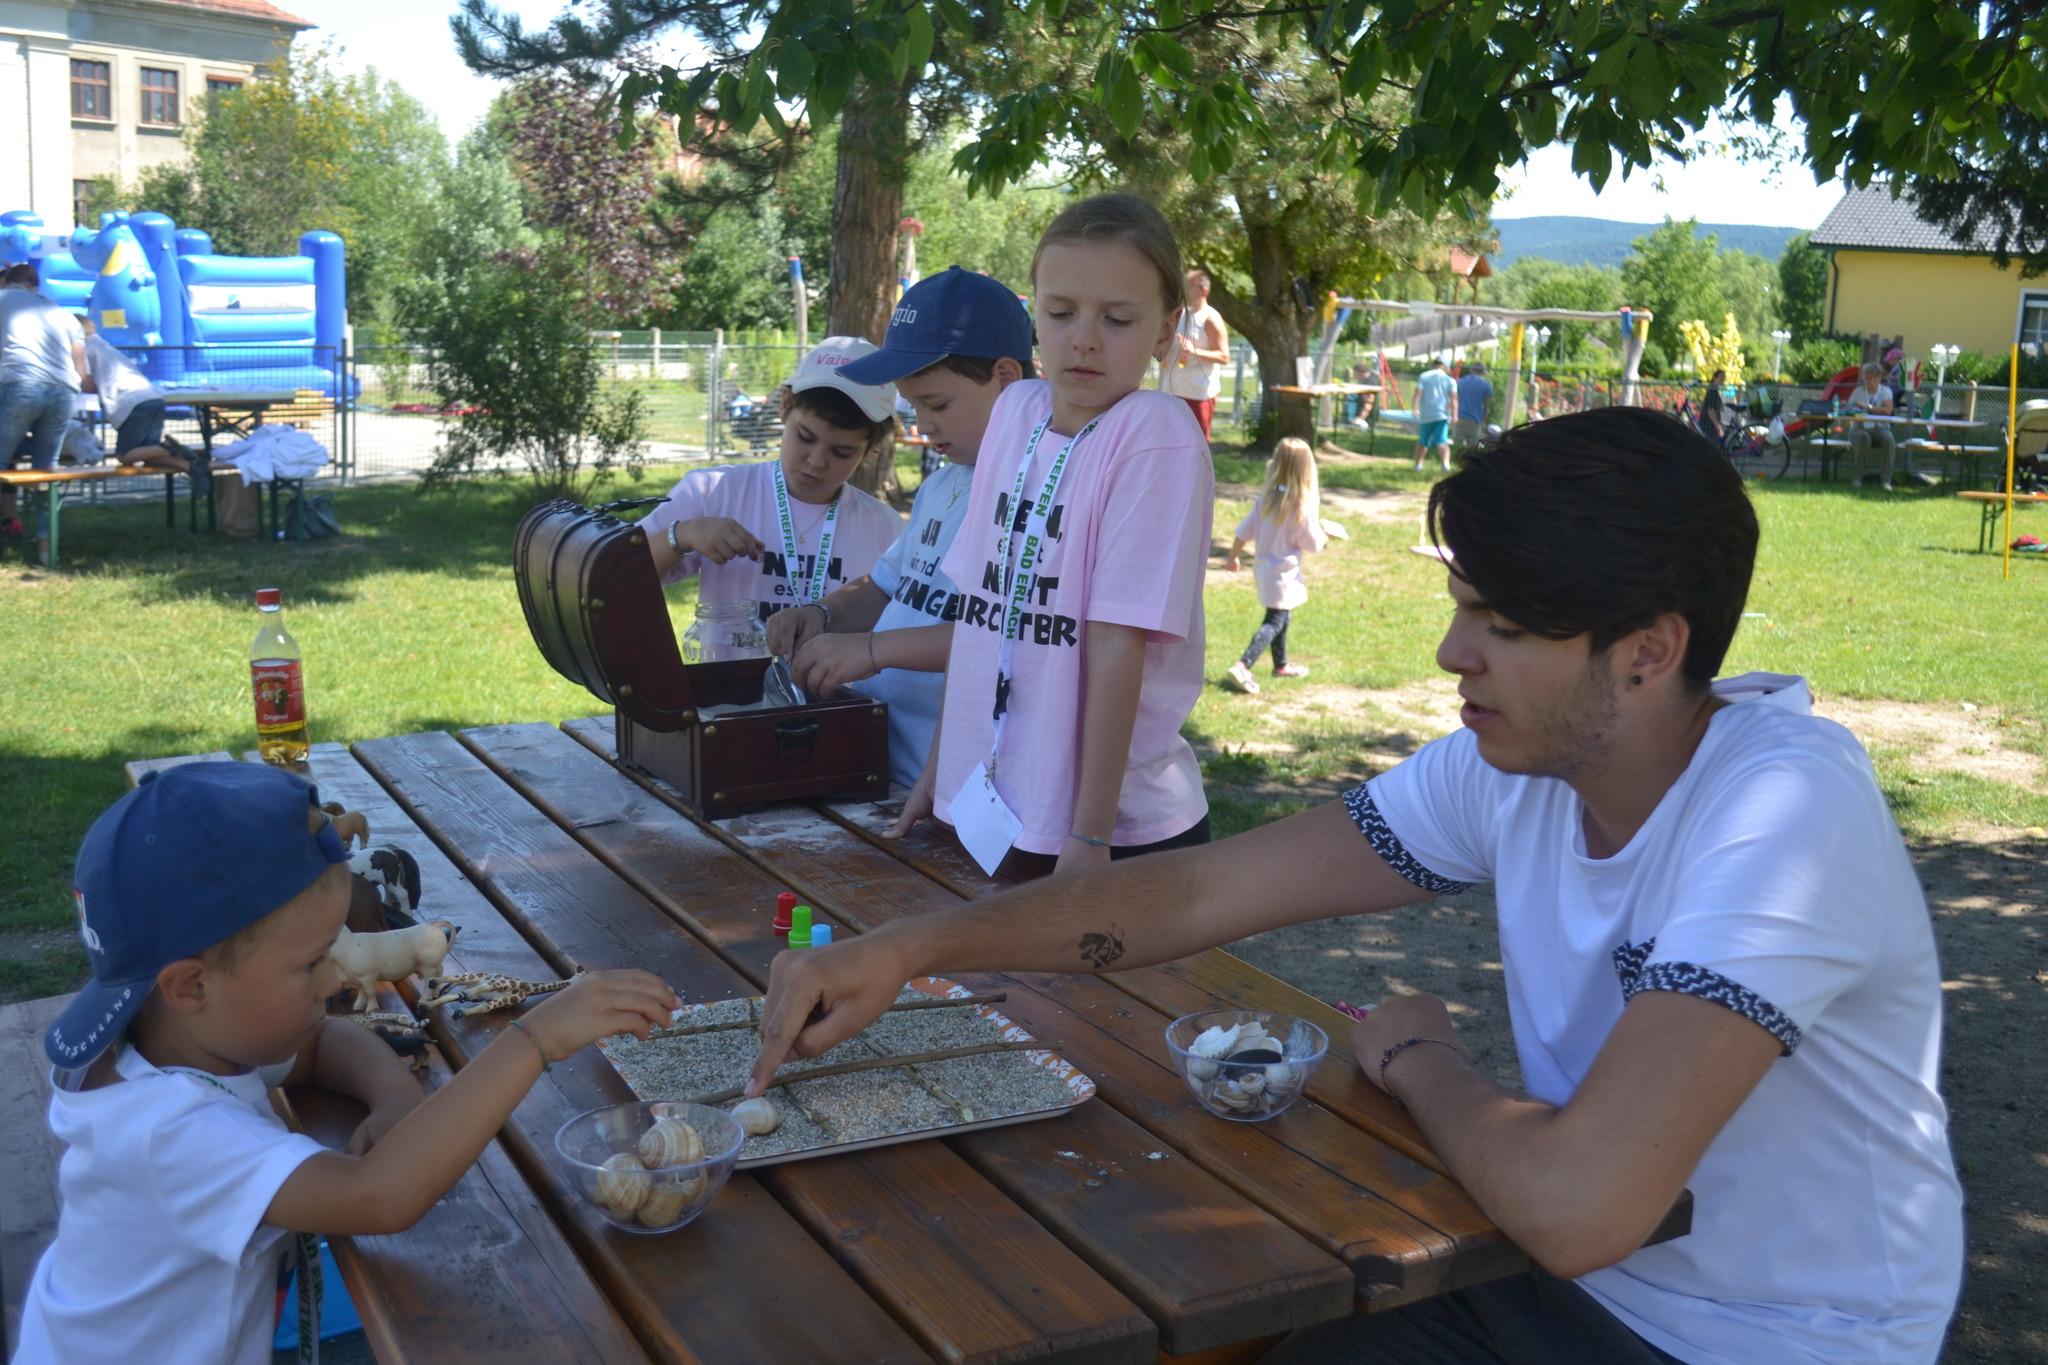 Jugendinitiative Bad Erlach - Verein fr Jugendarbeit